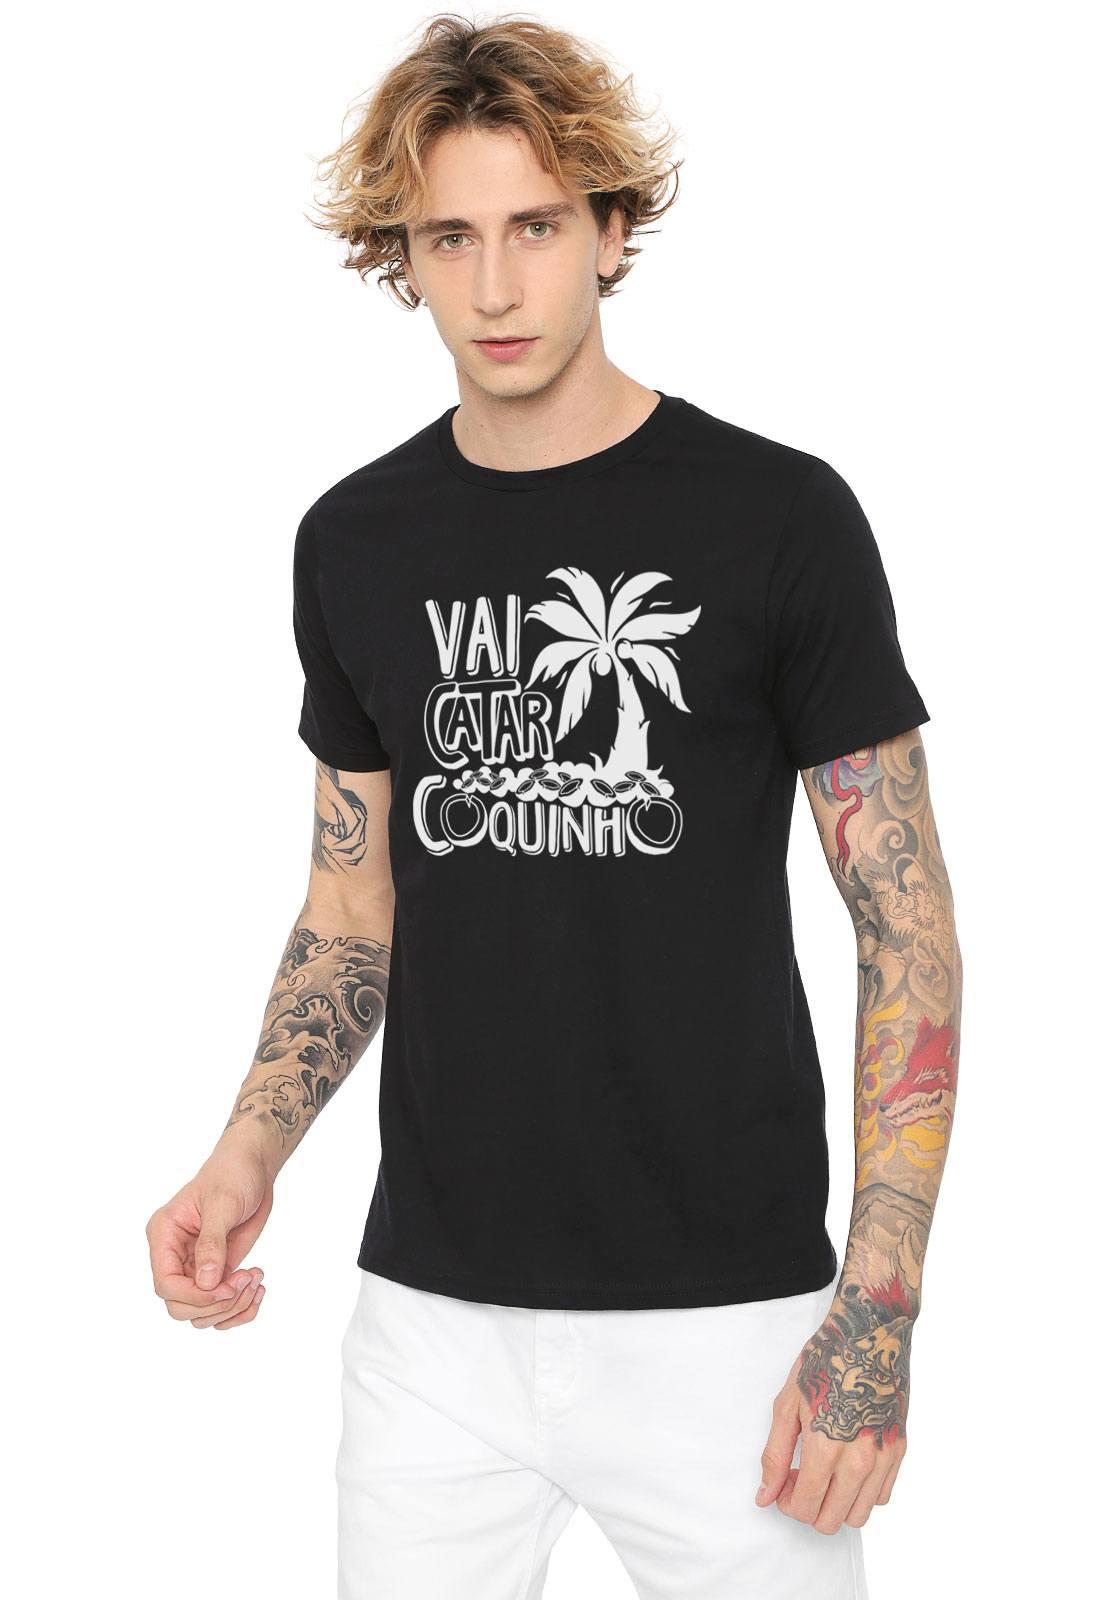 Camiseta Estampada Vai Catar Coquinho